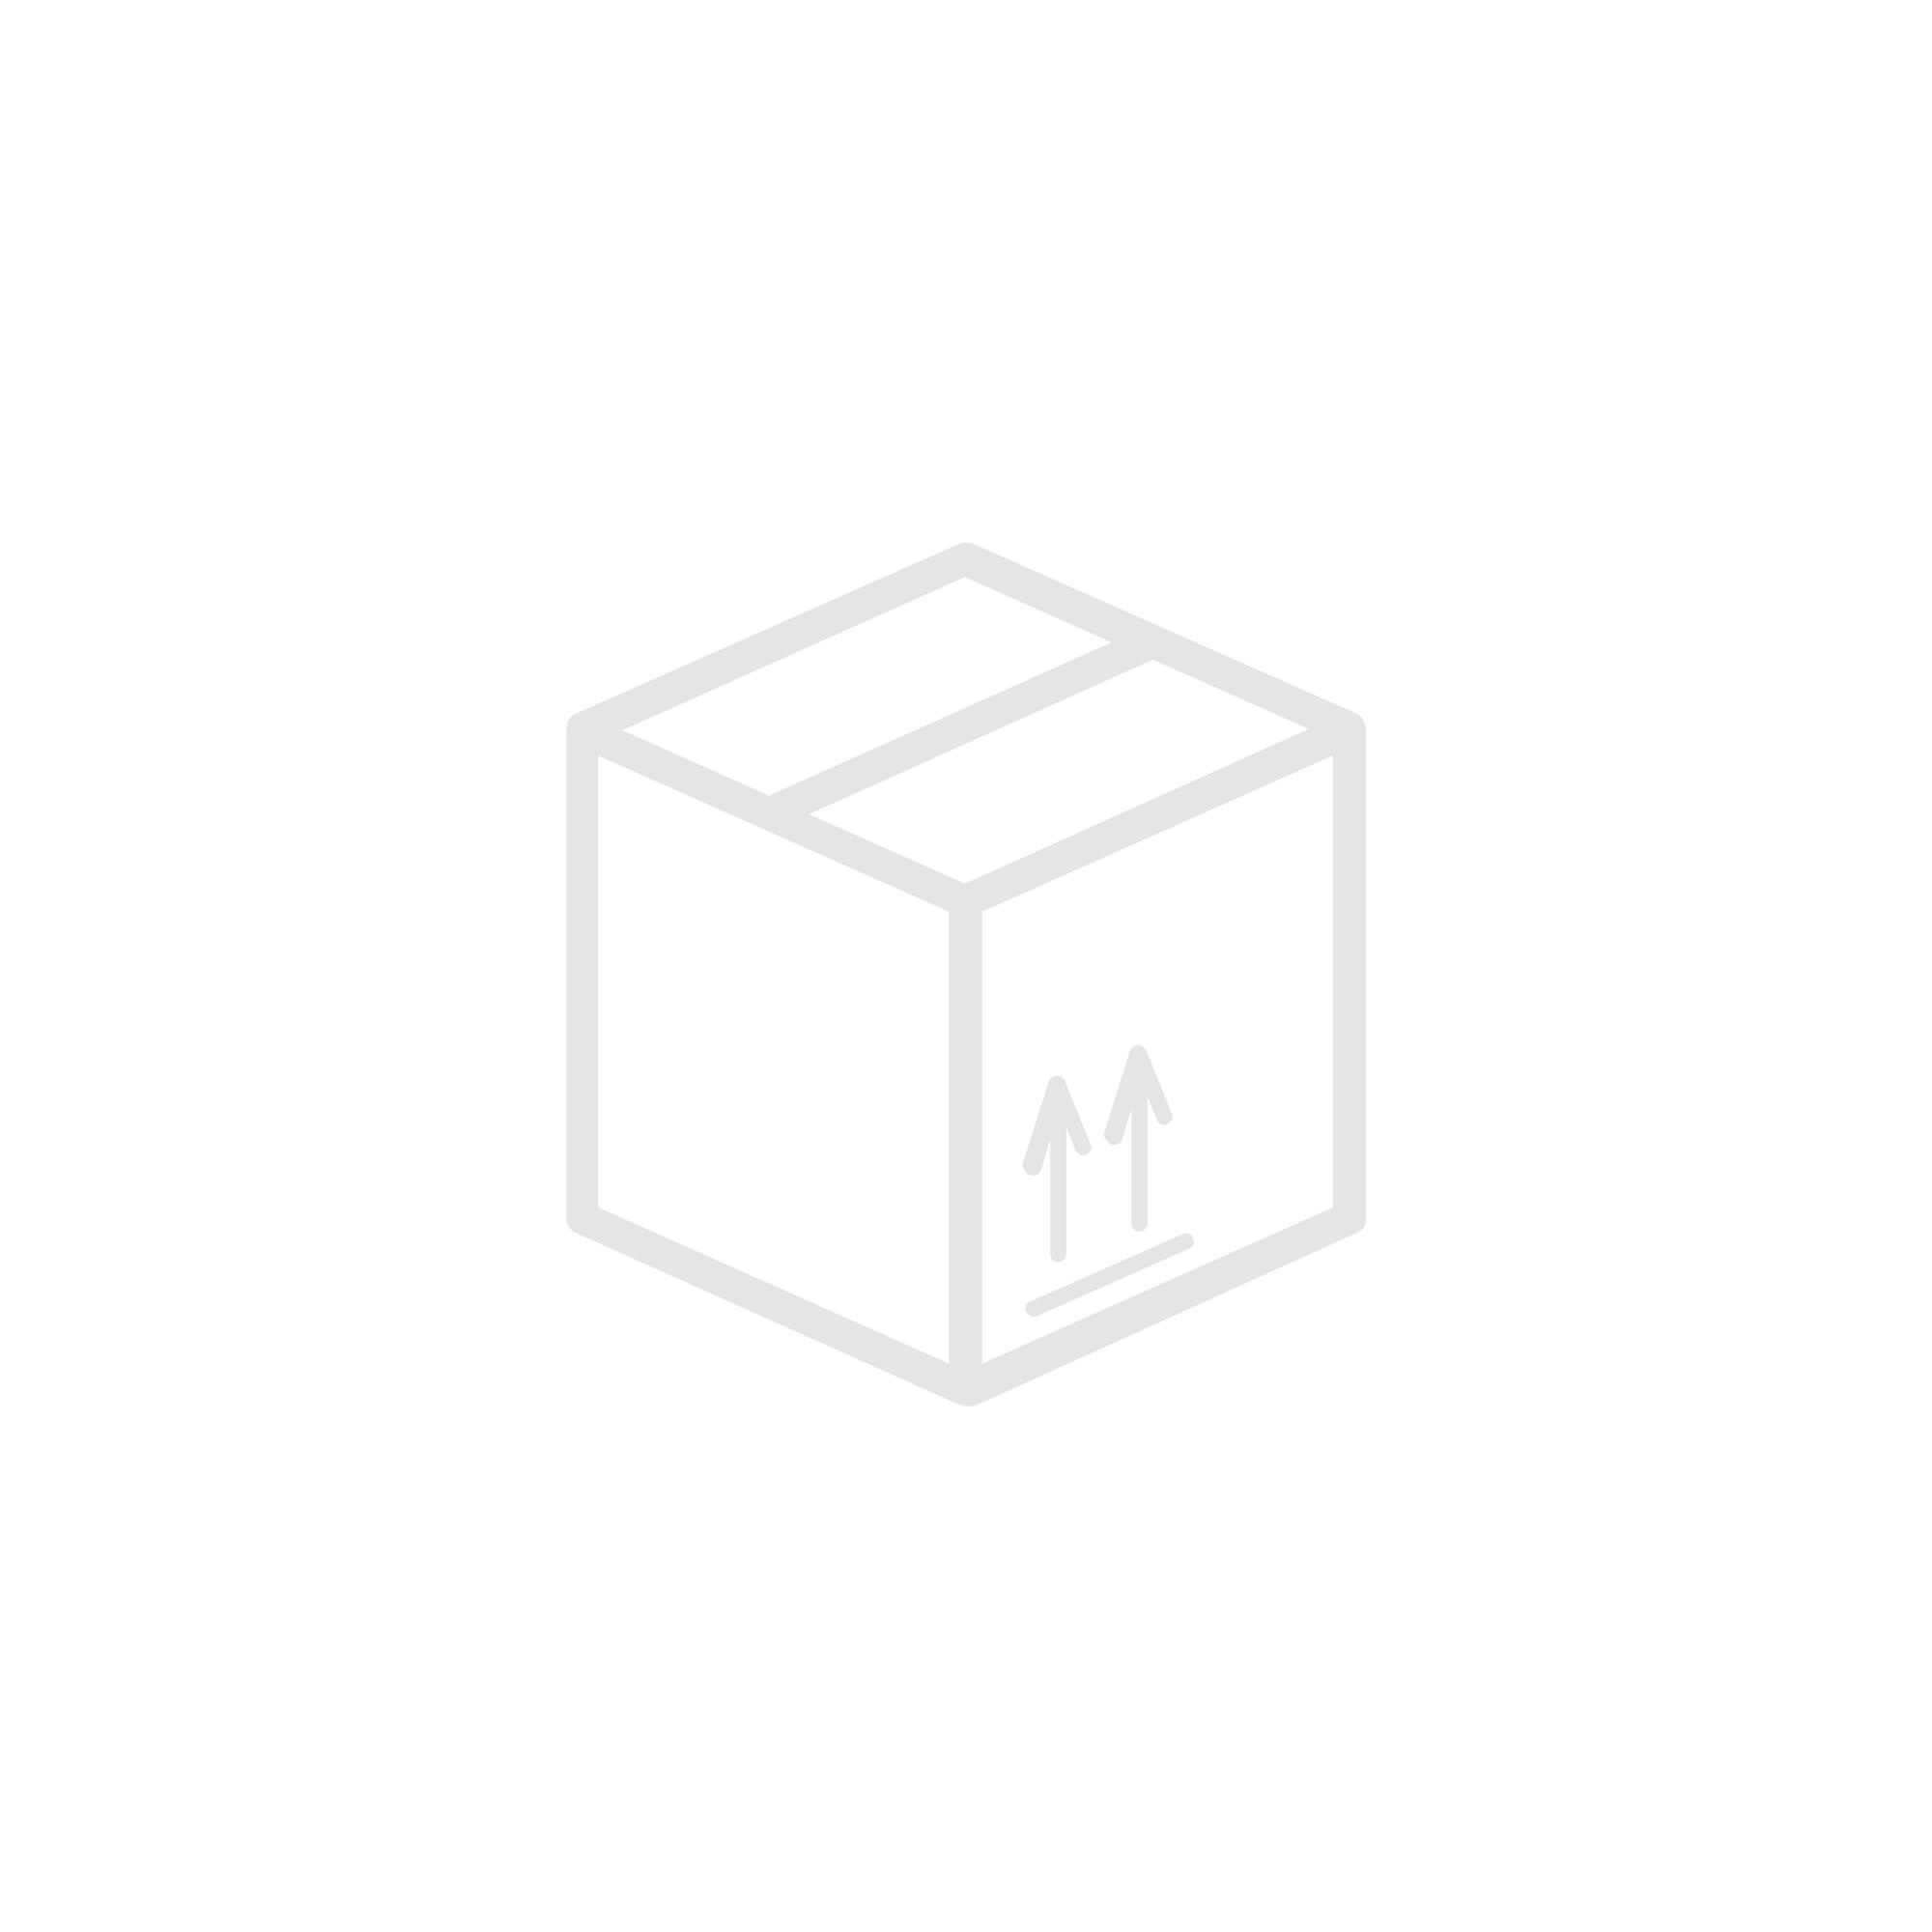 MCLED Napaječ LED 24V/10A ML-732.019.10.1